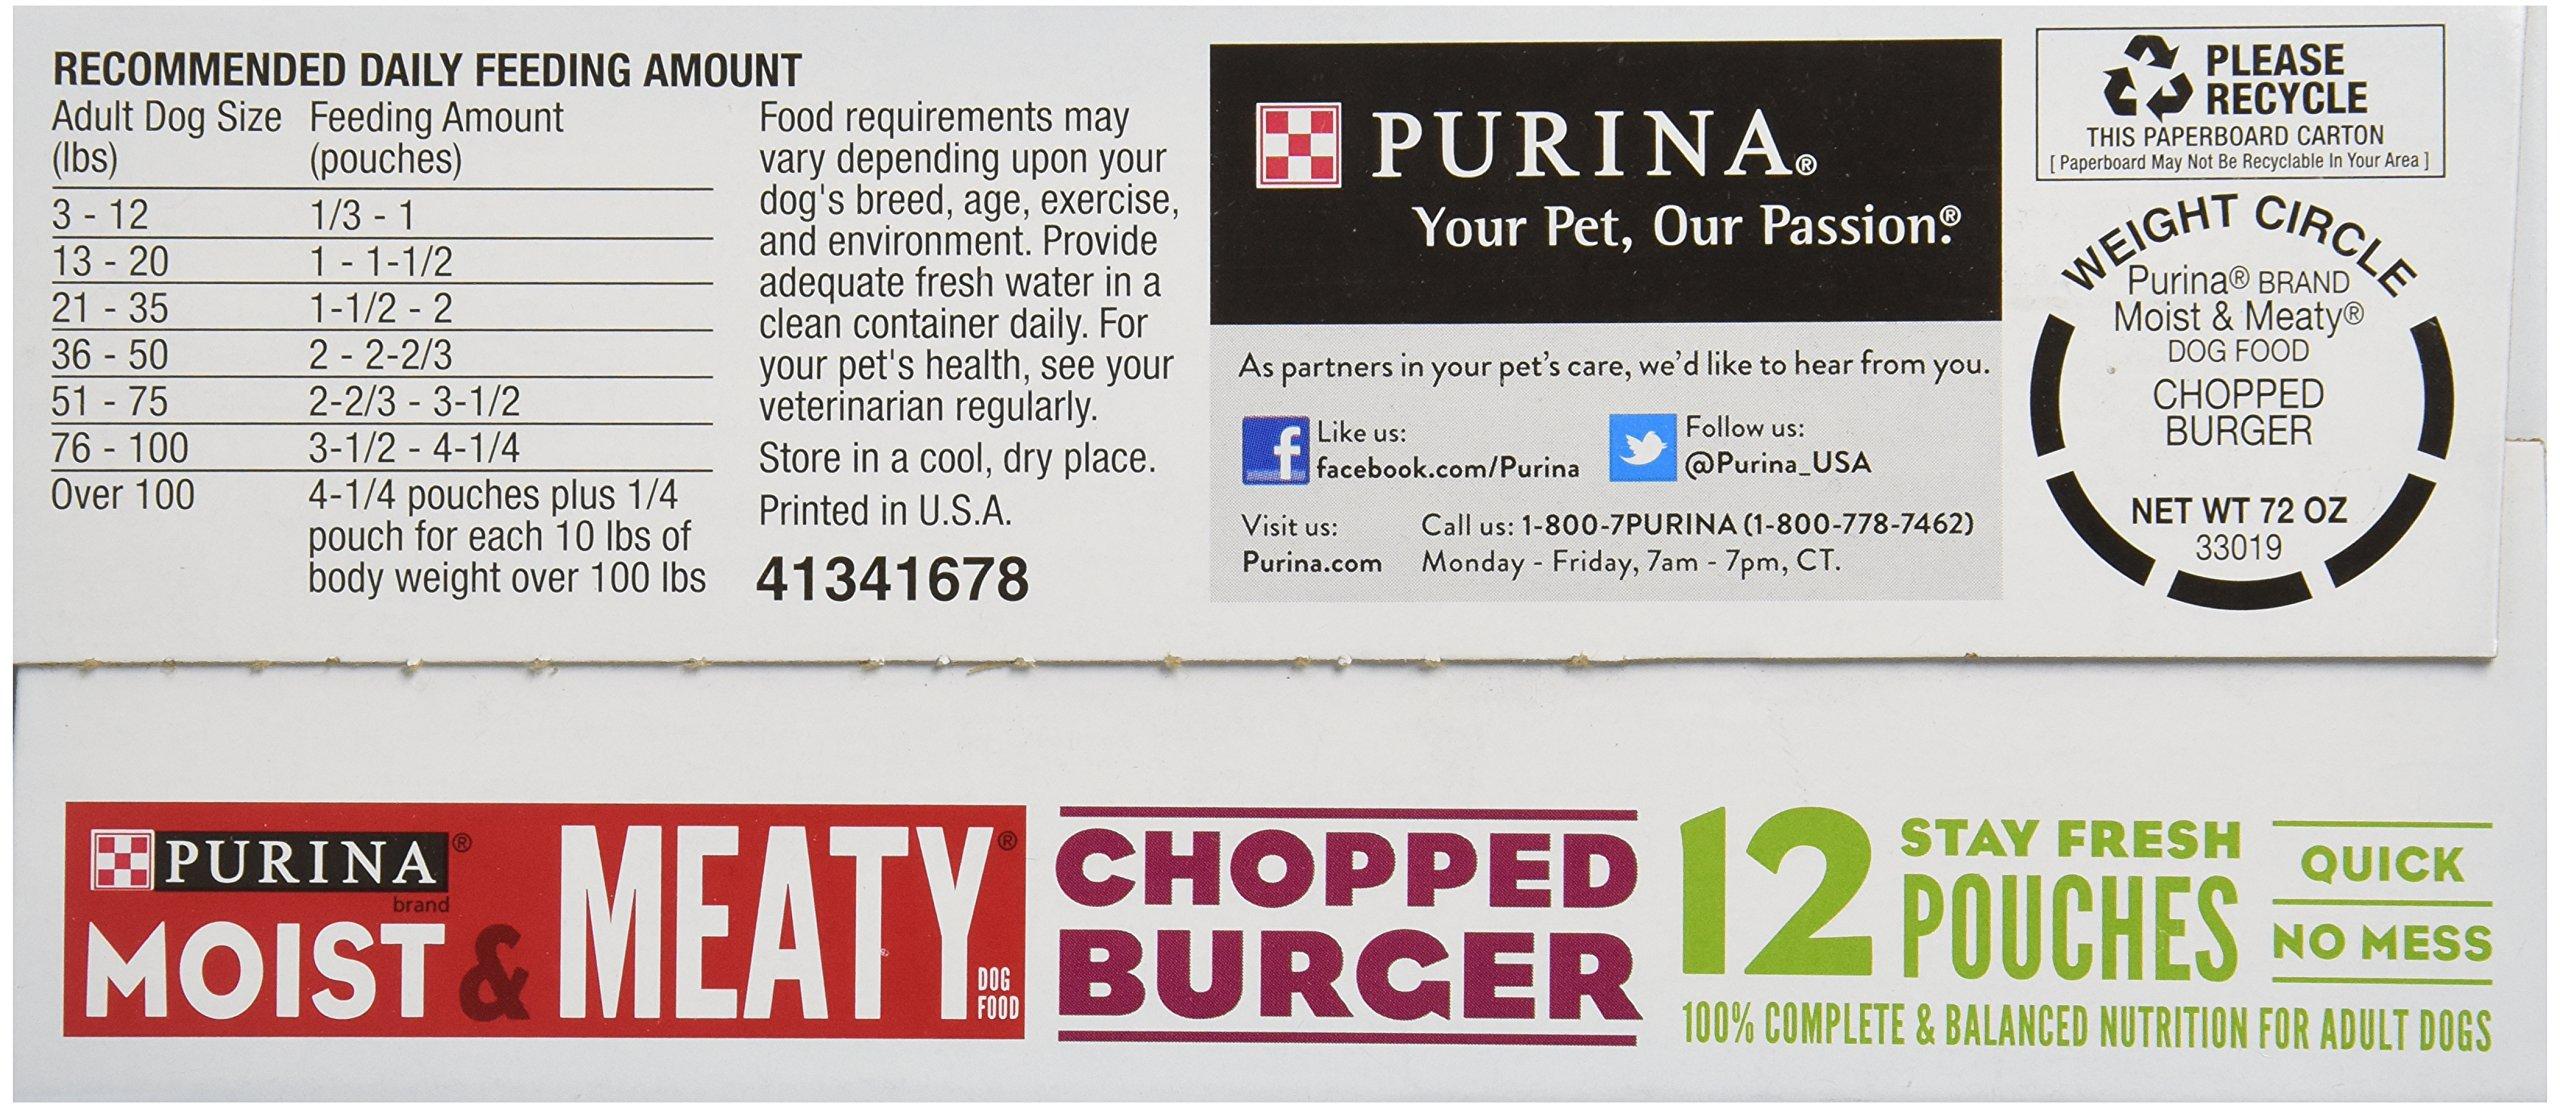 Purina Moist & Meaty Dog Food, Chopped Burger, 12 Pouches, 6 oz each by Moist & Meaty (Image #4)